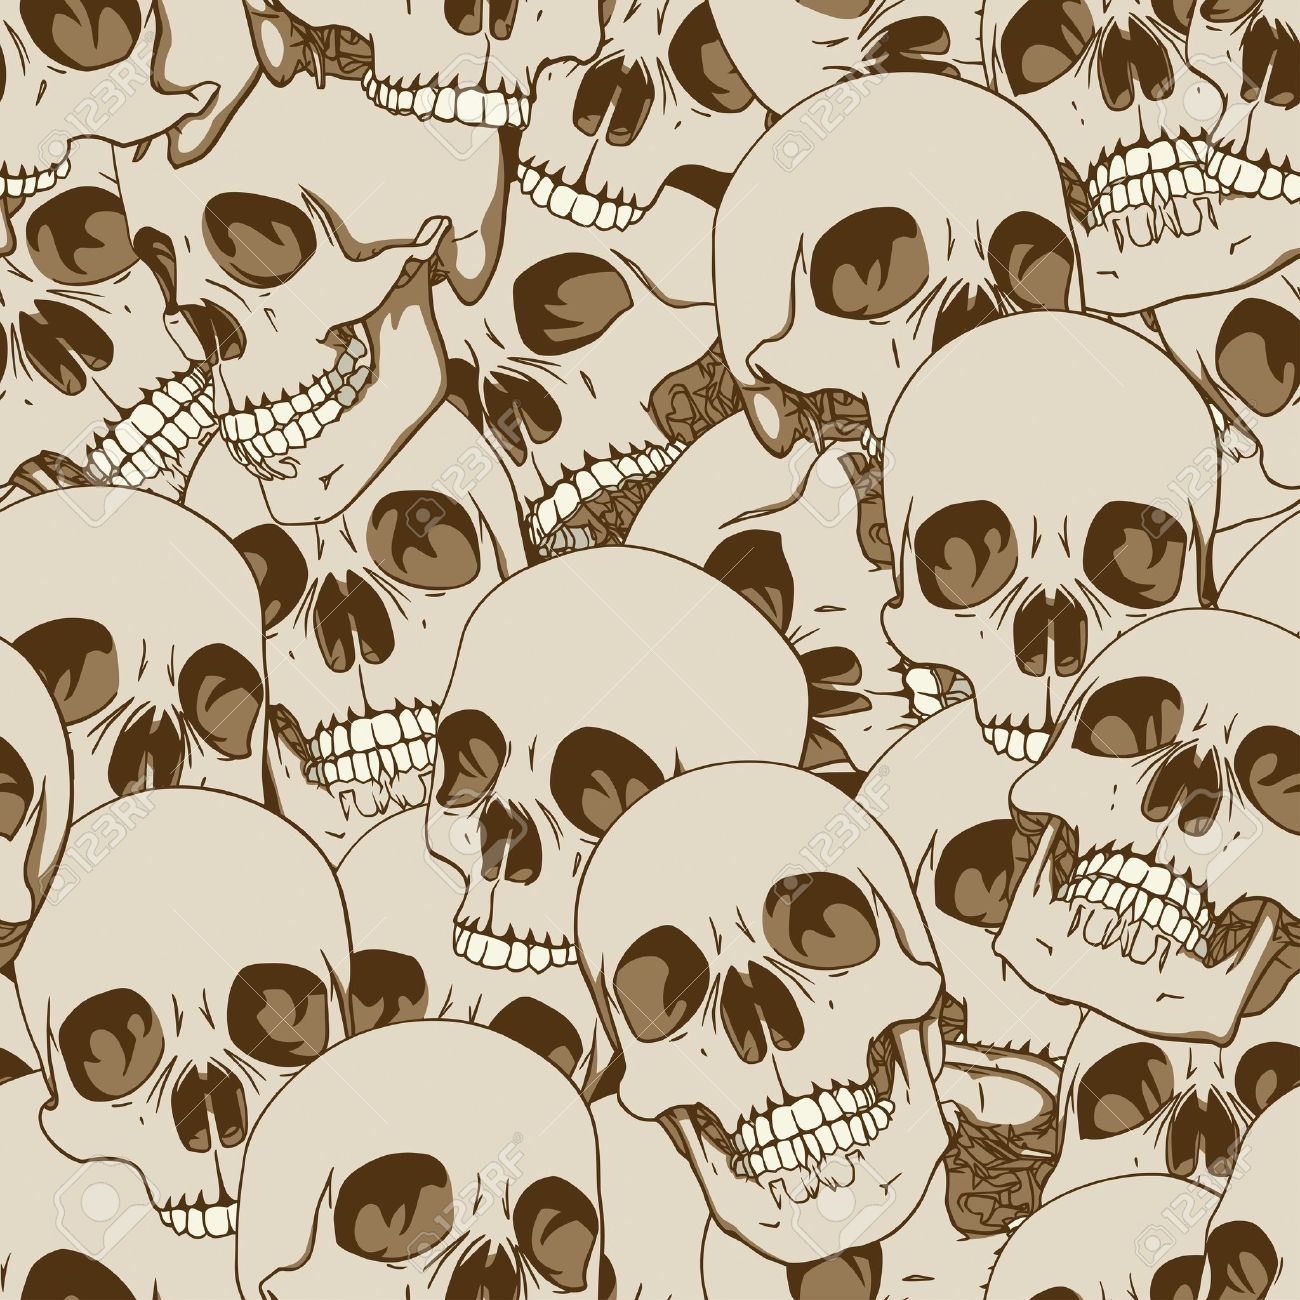 Human skulls seamless background illustration Stock Vector - 12798776